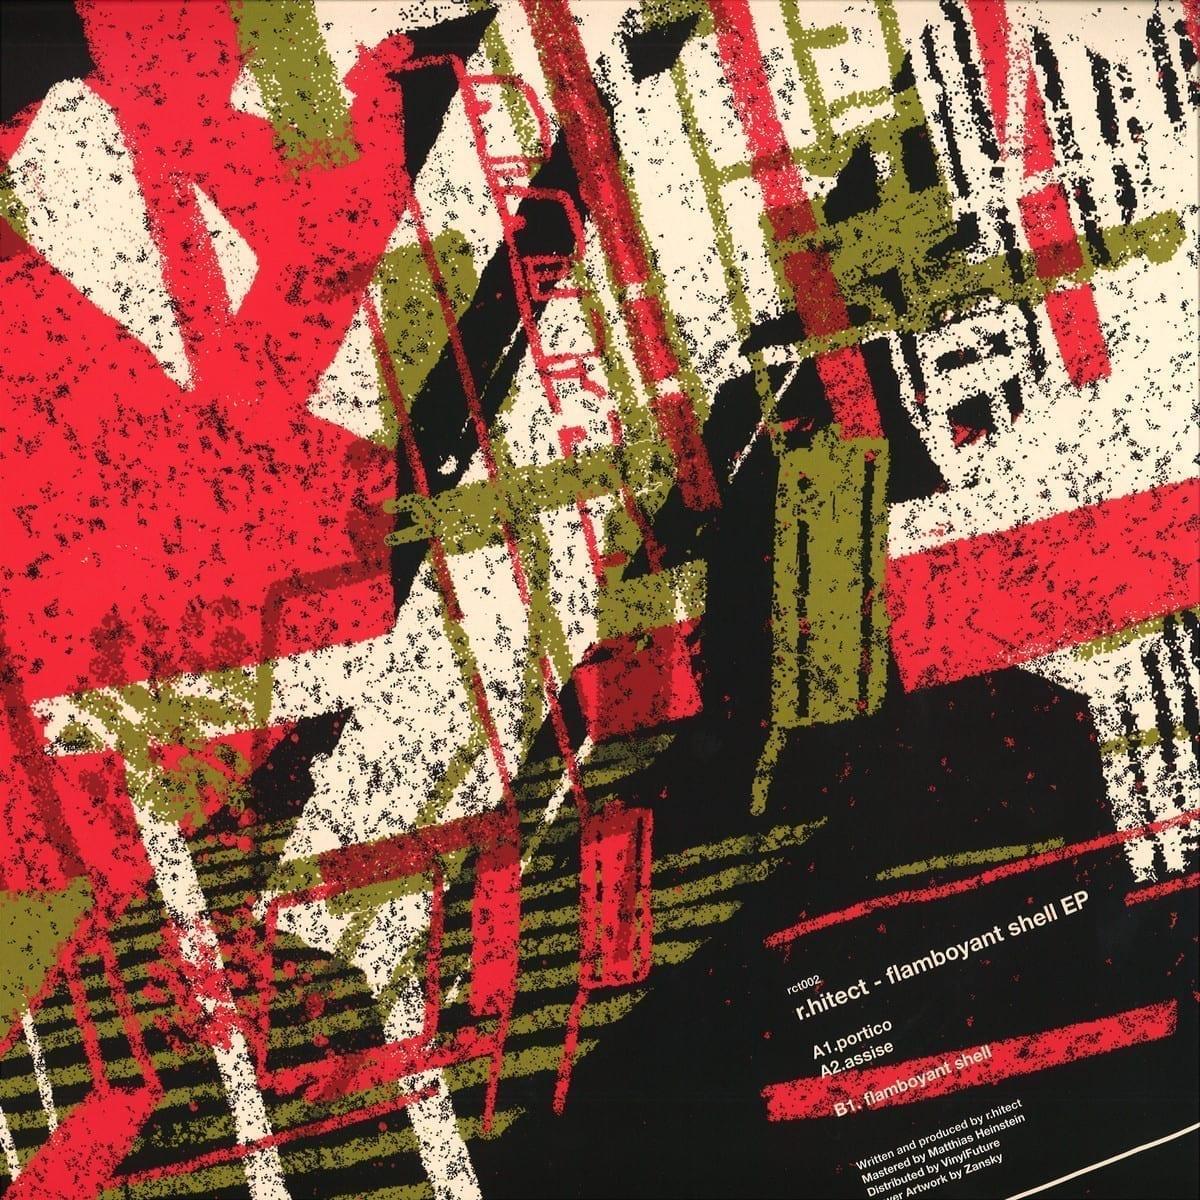 r.hitect - Flamboyant Shell EP [r.hitect] back